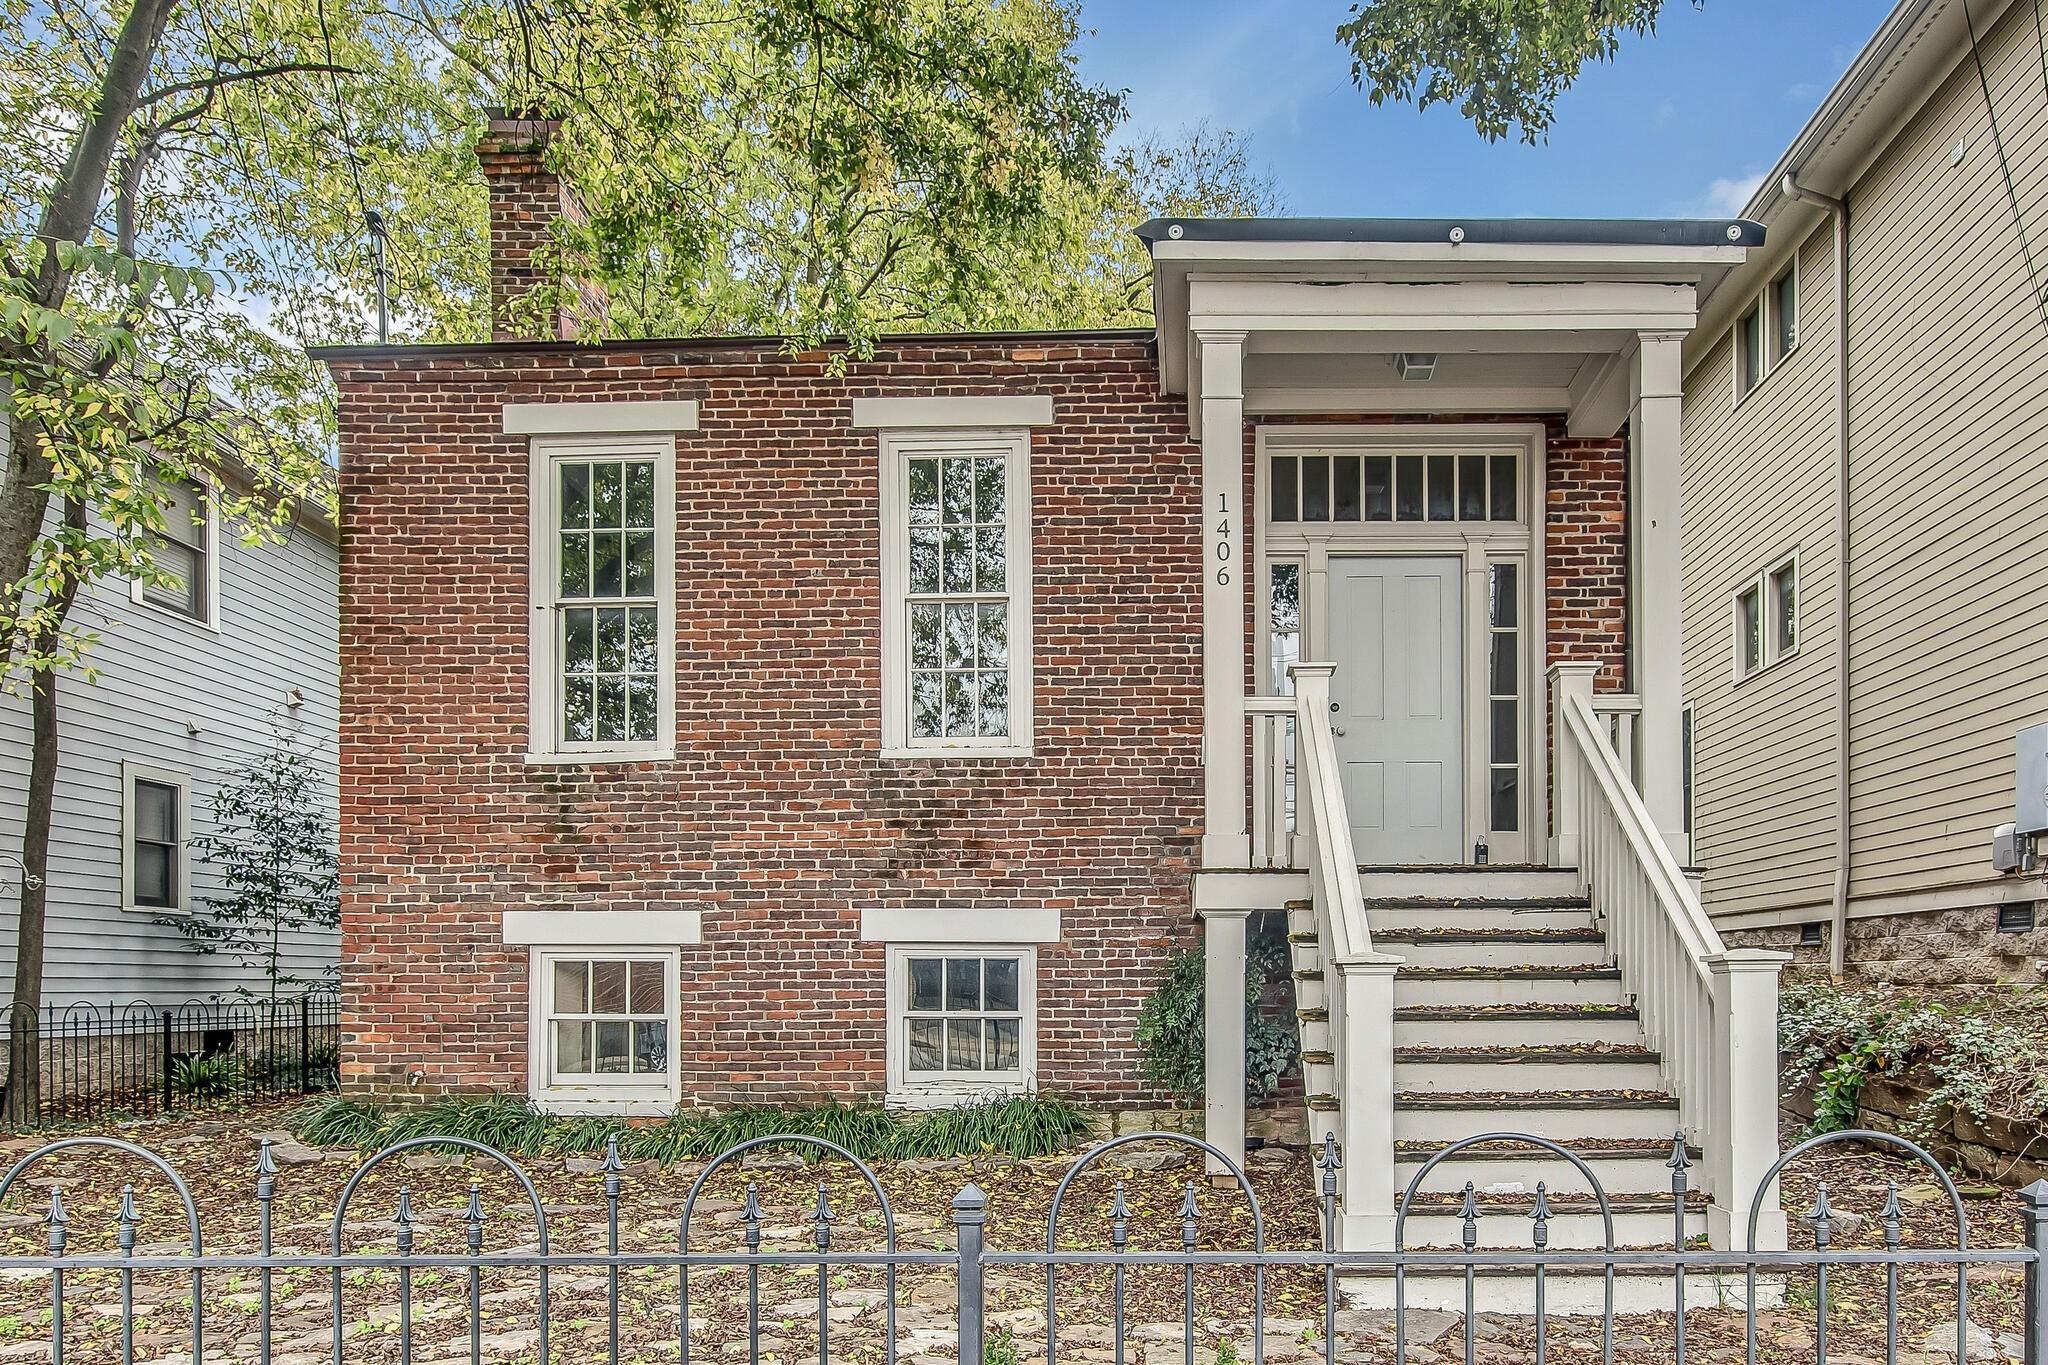 1406 5th Ave N Property Photo - Nashville, TN real estate listing